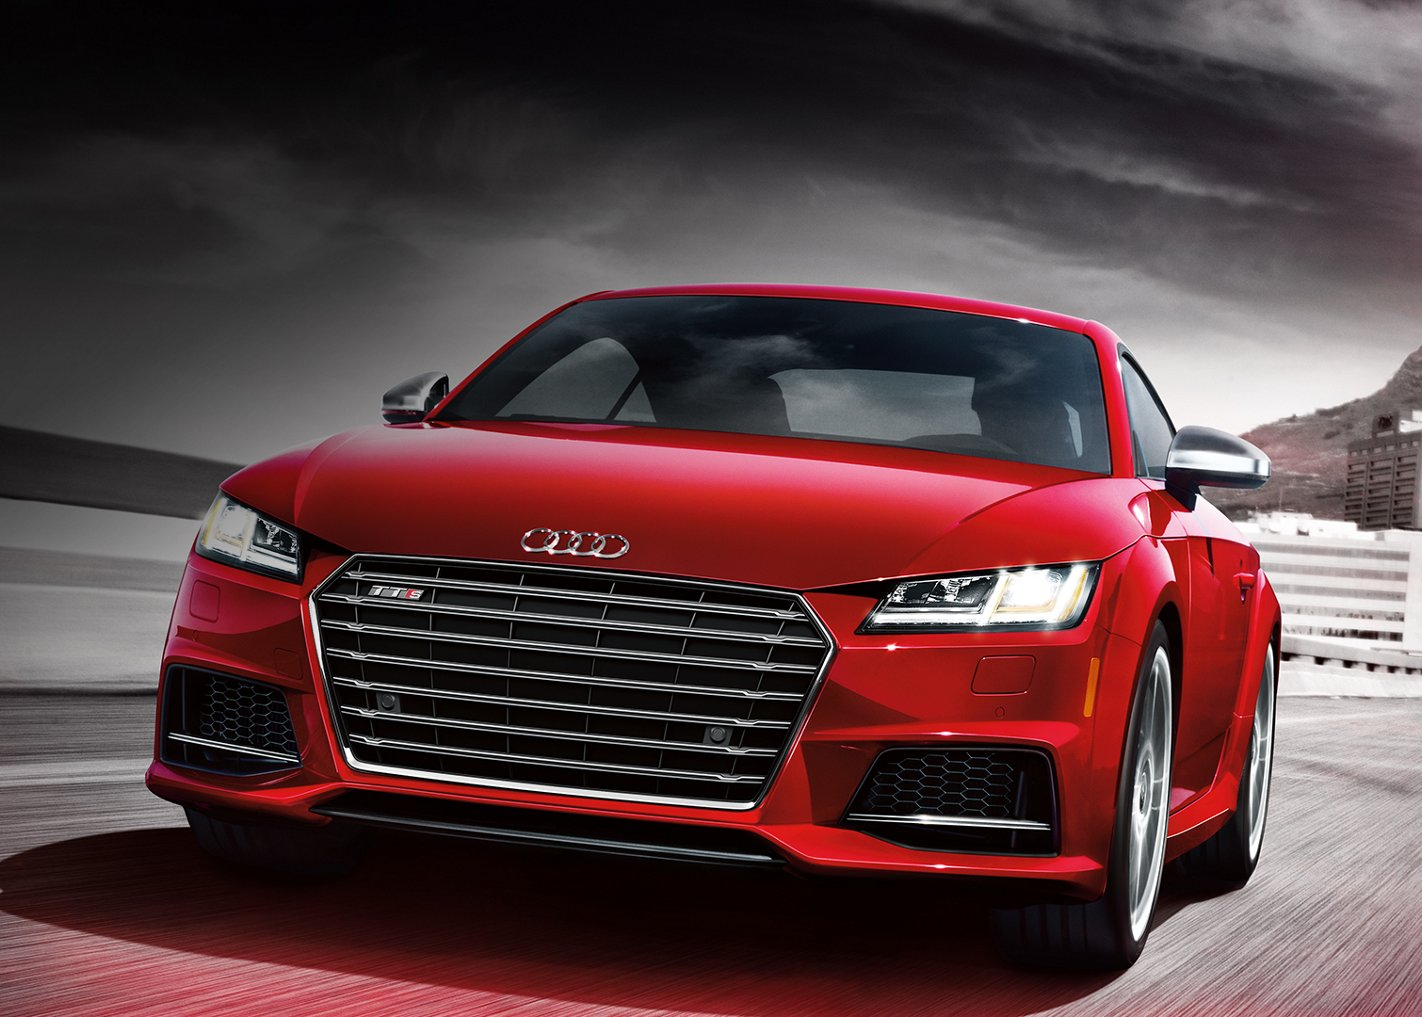 New Audi TTS Exterior main image